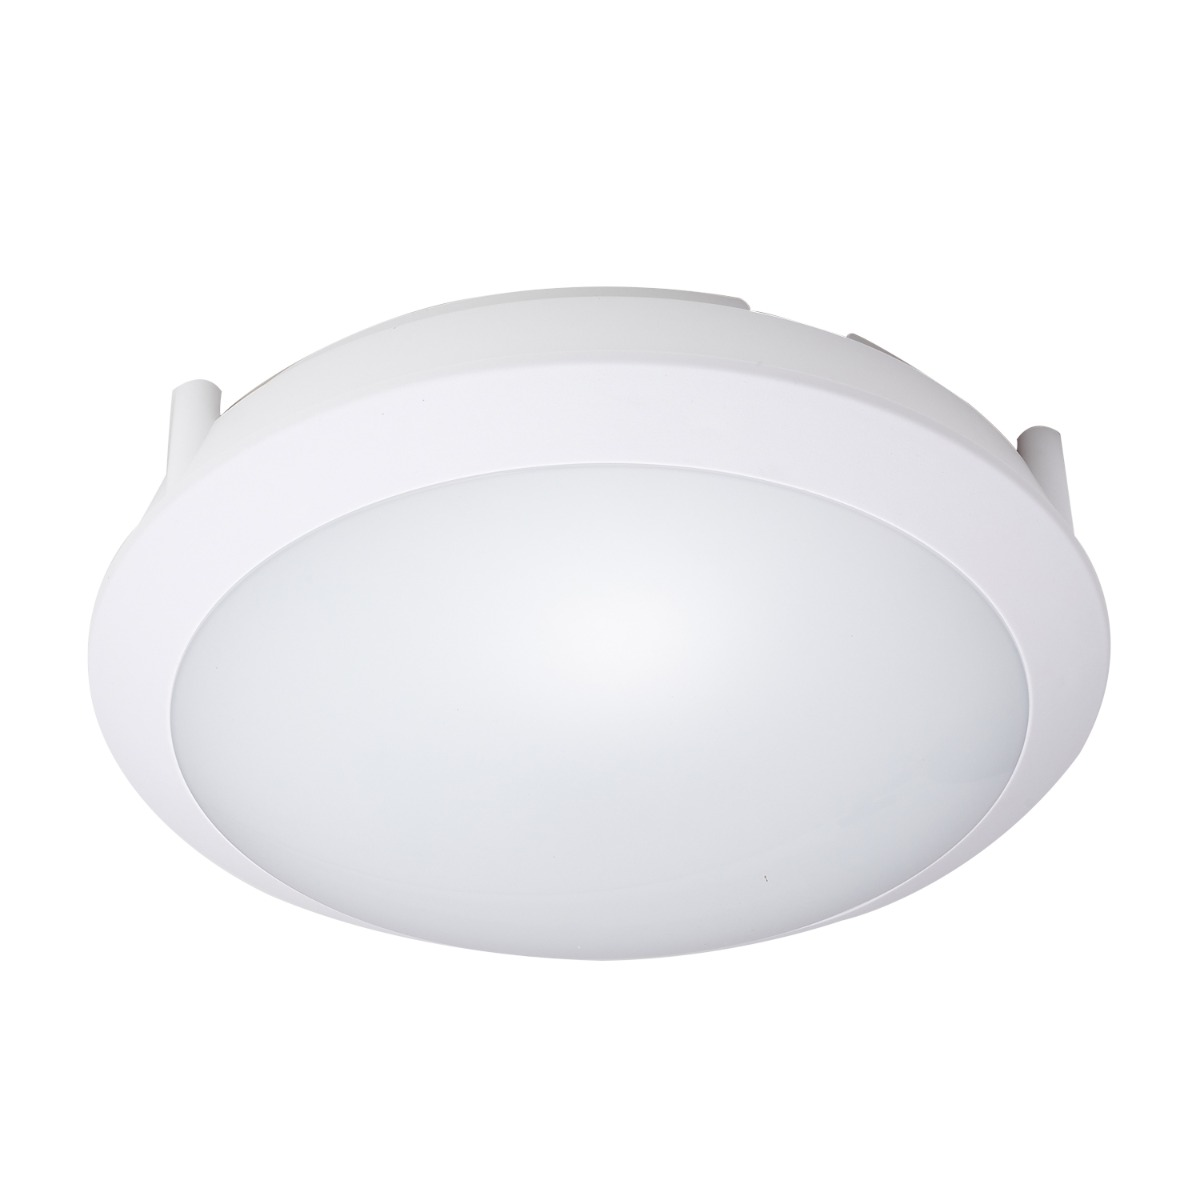 Noxion LED Bulkhead Pro 20W 2700K/3000K/4000K Tunable White   2000lm - Emergency Unit 3H - Replacer for 2x26W